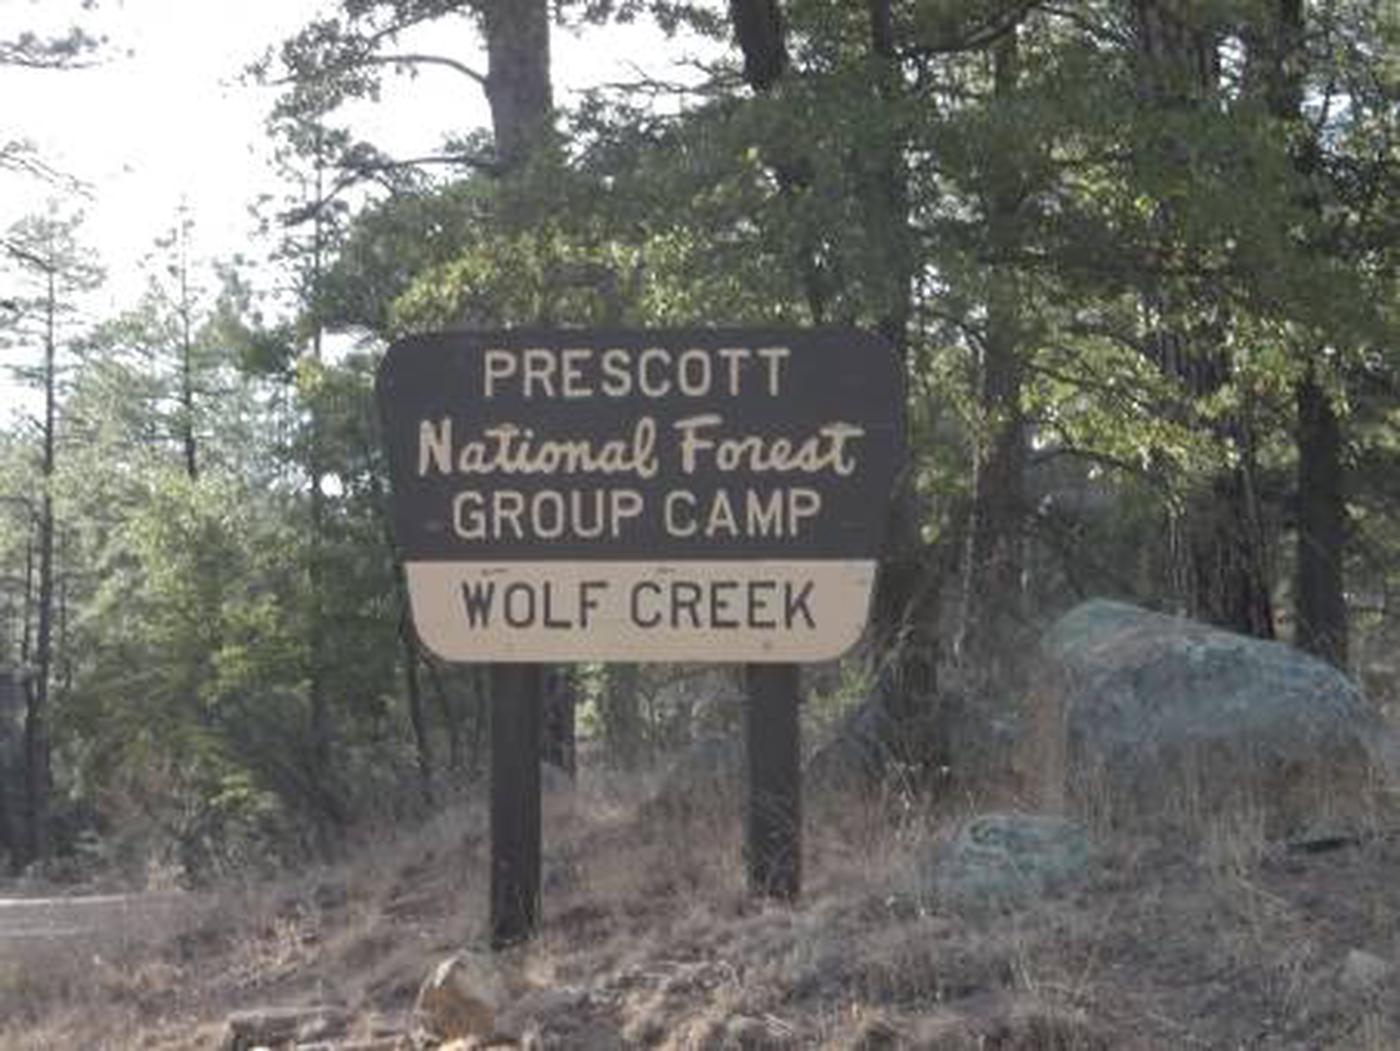 UPPER WOLF CREEK GROUP- SITE ENTRANCEUPPER WOLF CREEK GROUP-SITE ENTRANCE